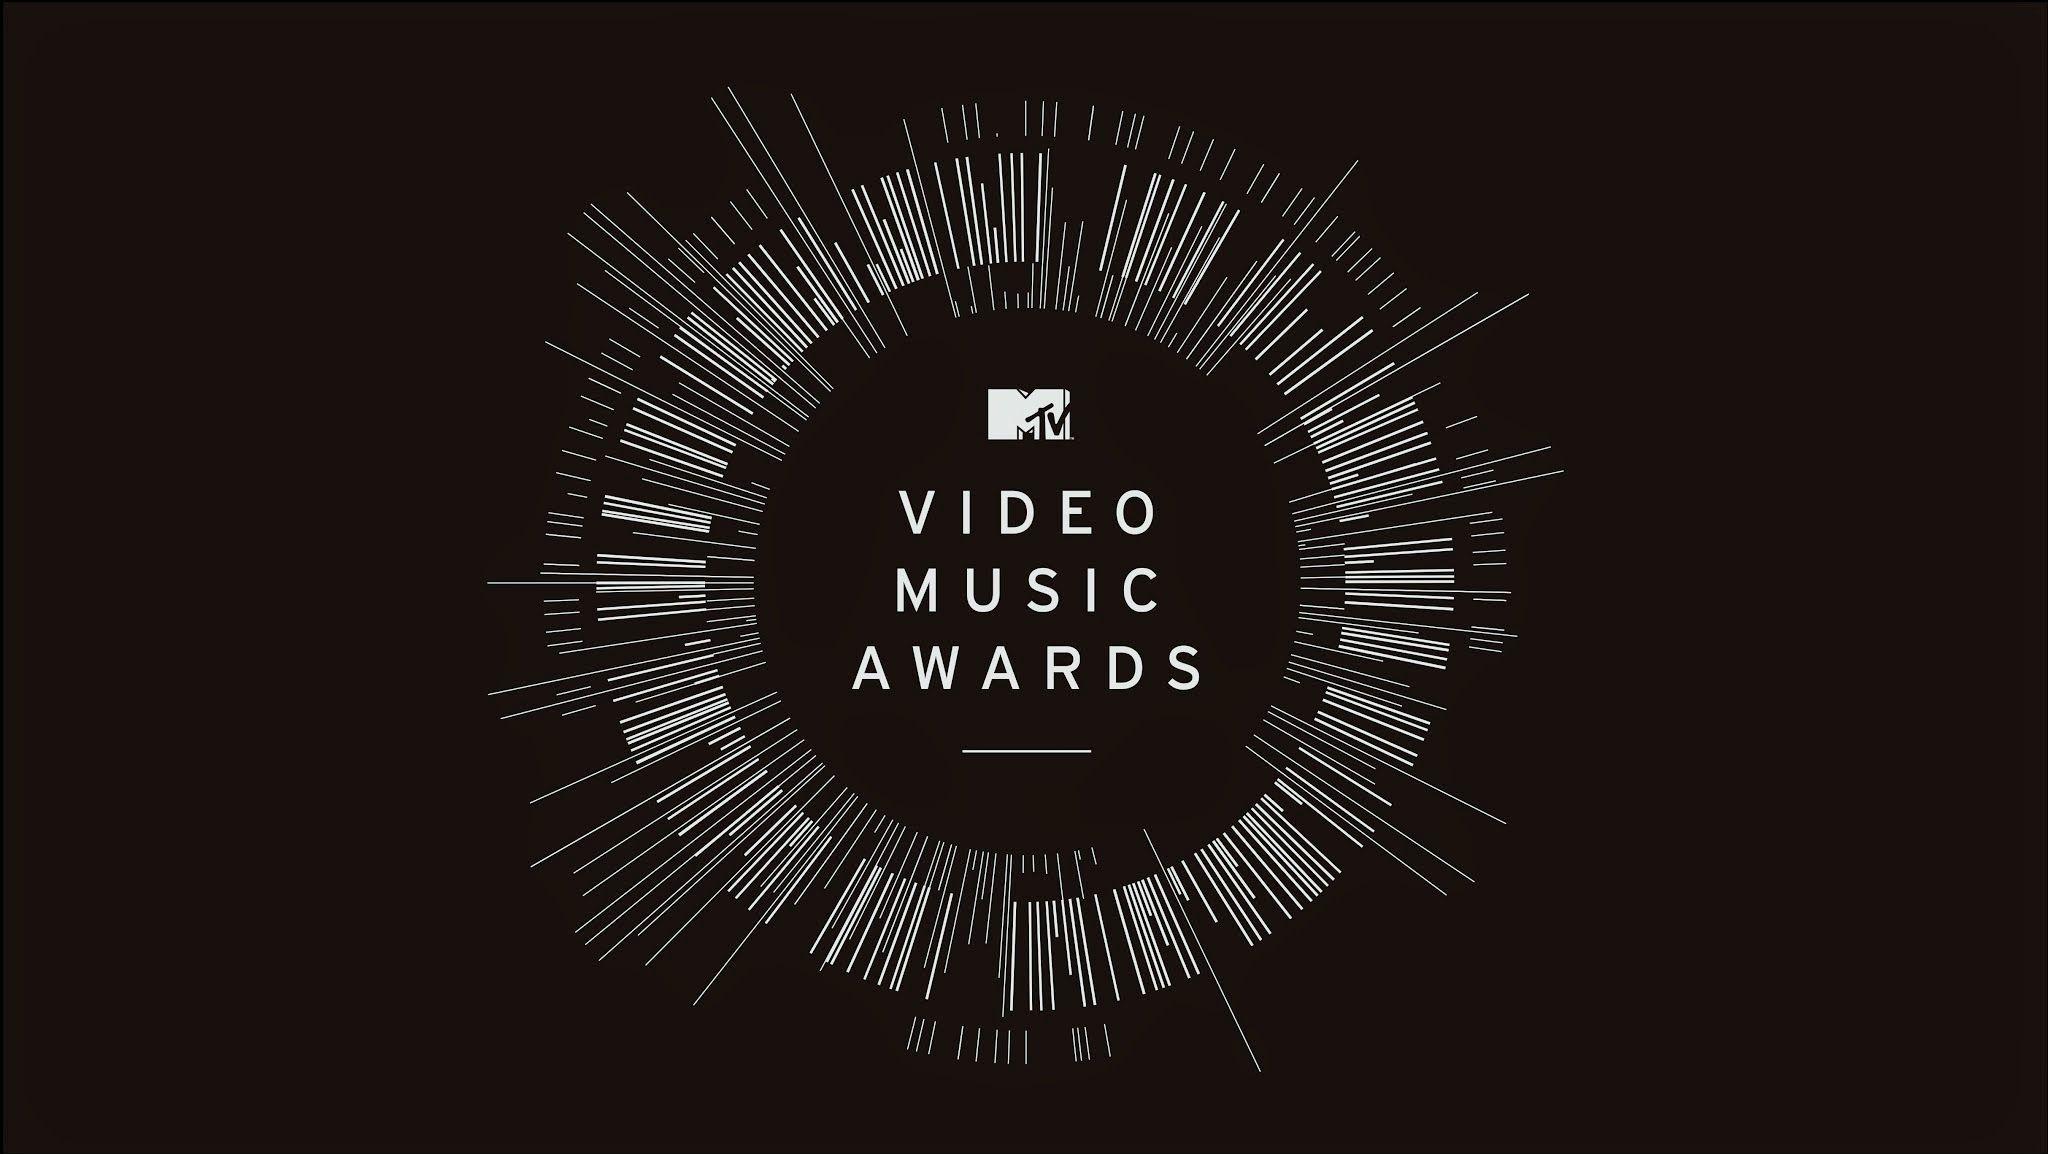 mtv-video-music-awards-2014-thatgrapejuice